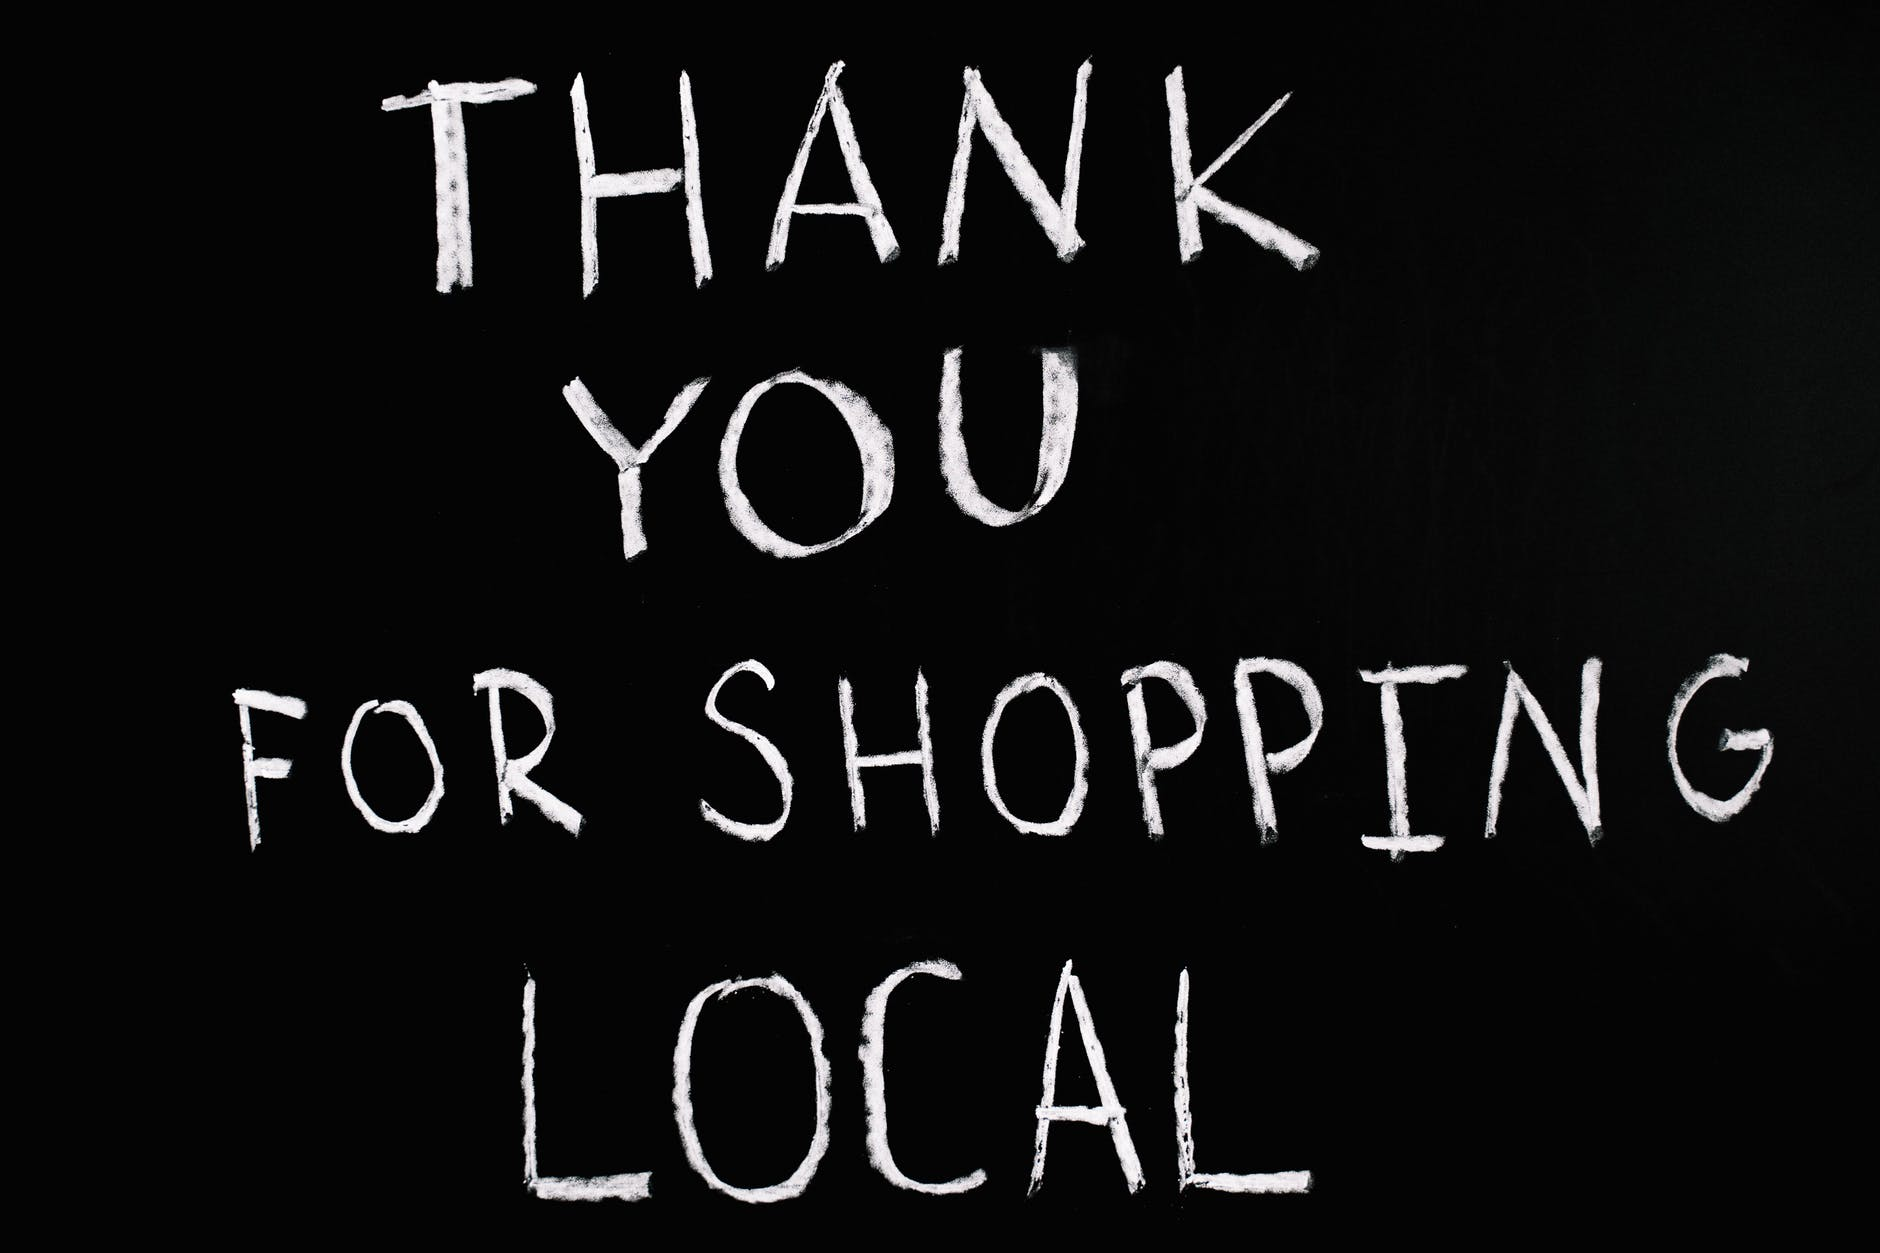 small-business-saturday-local